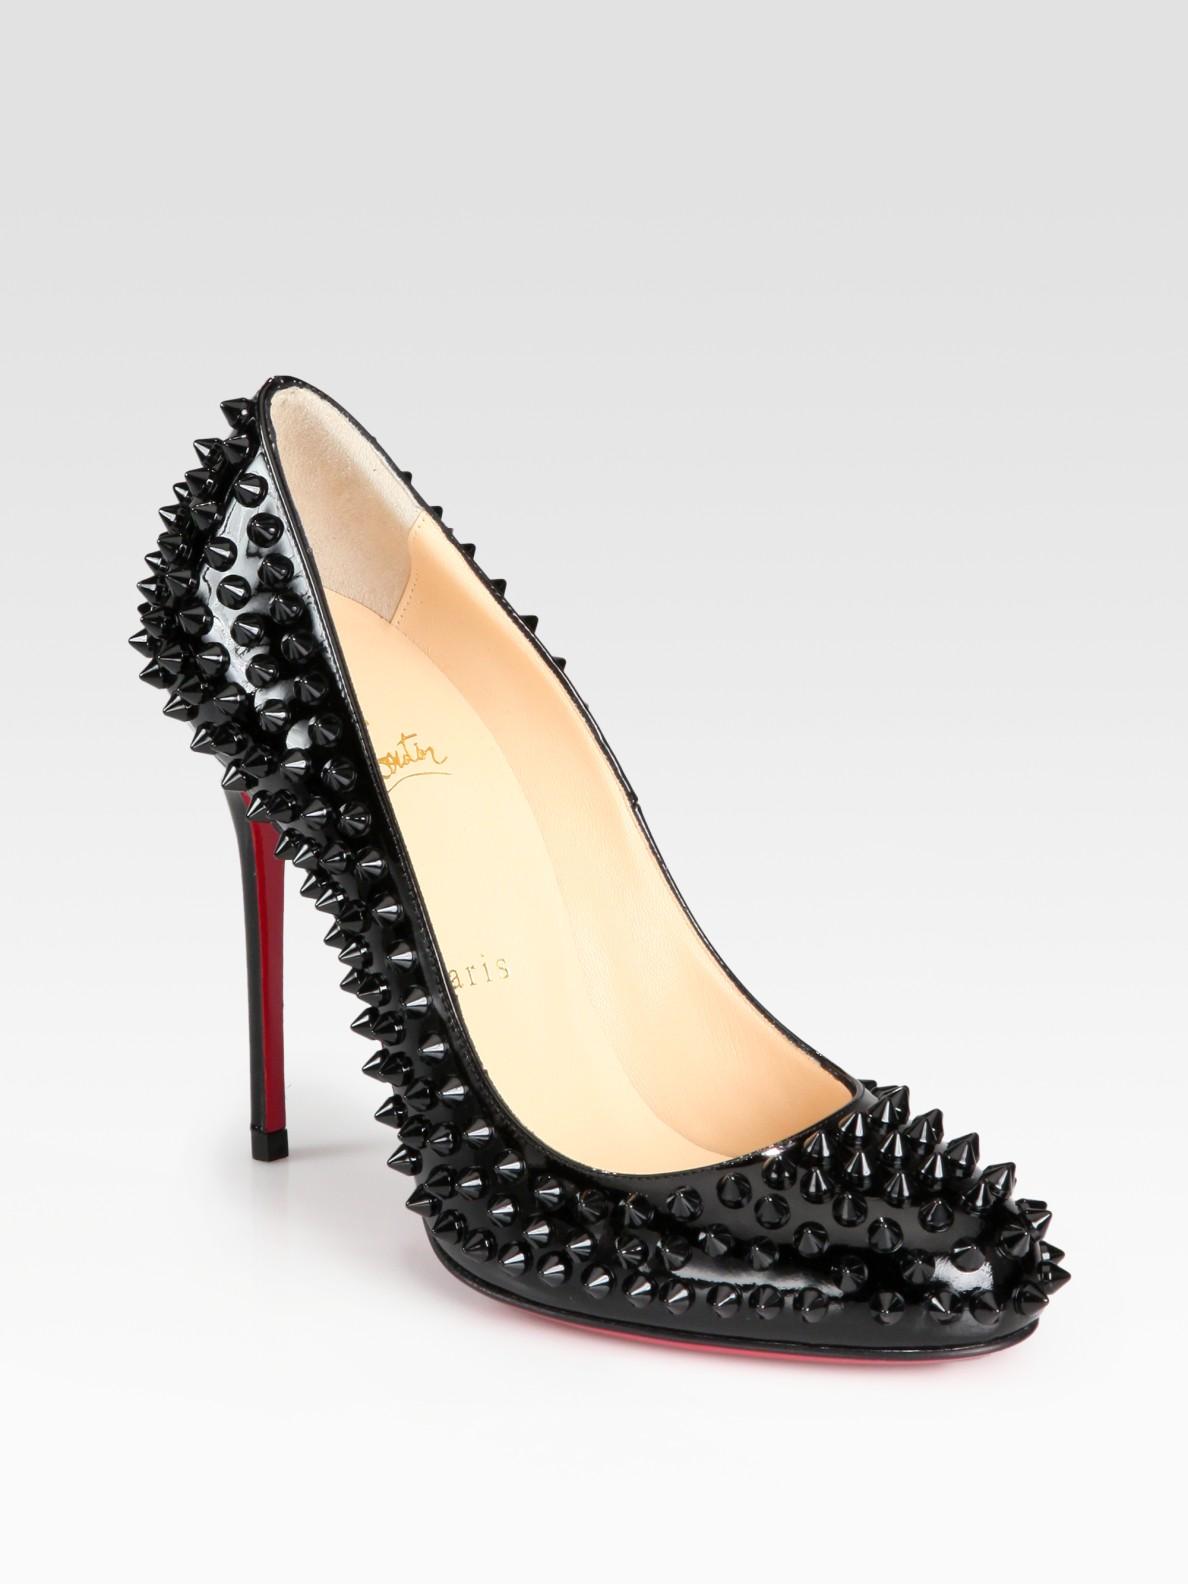 louboutin pink studded heels